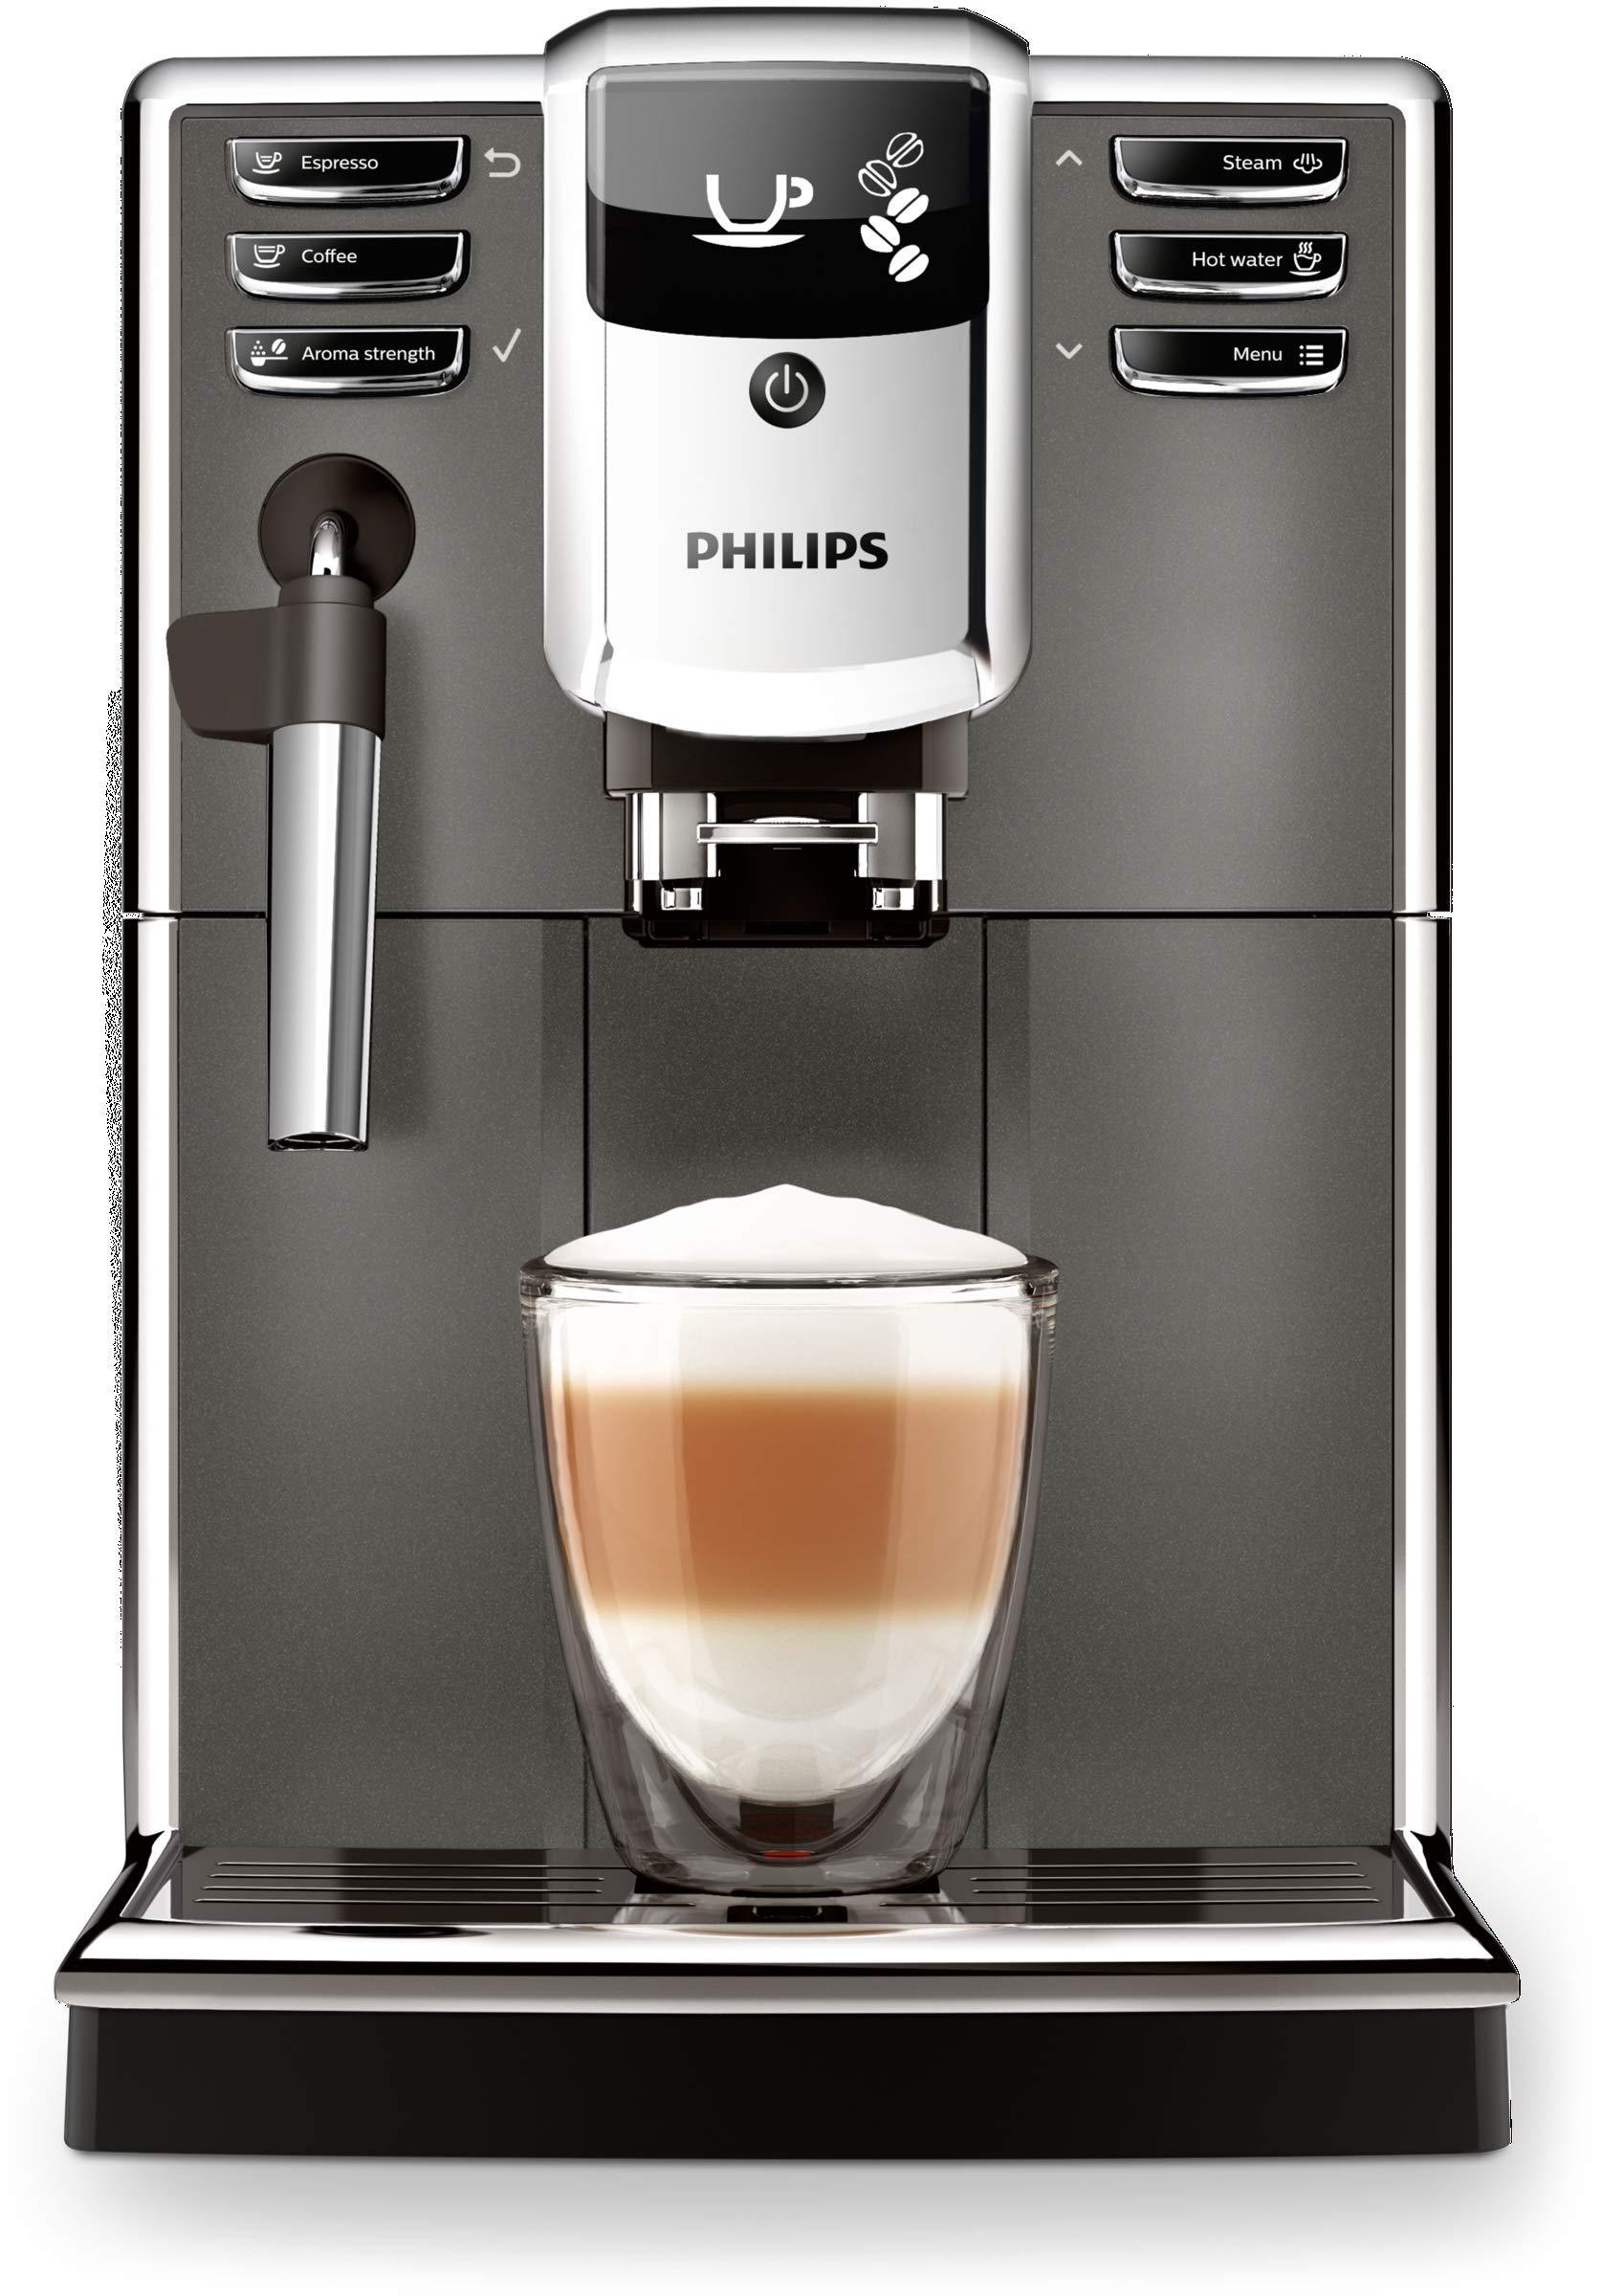 Philips-EP531410-Kaffeevollautomat-18-liters-Schwarz